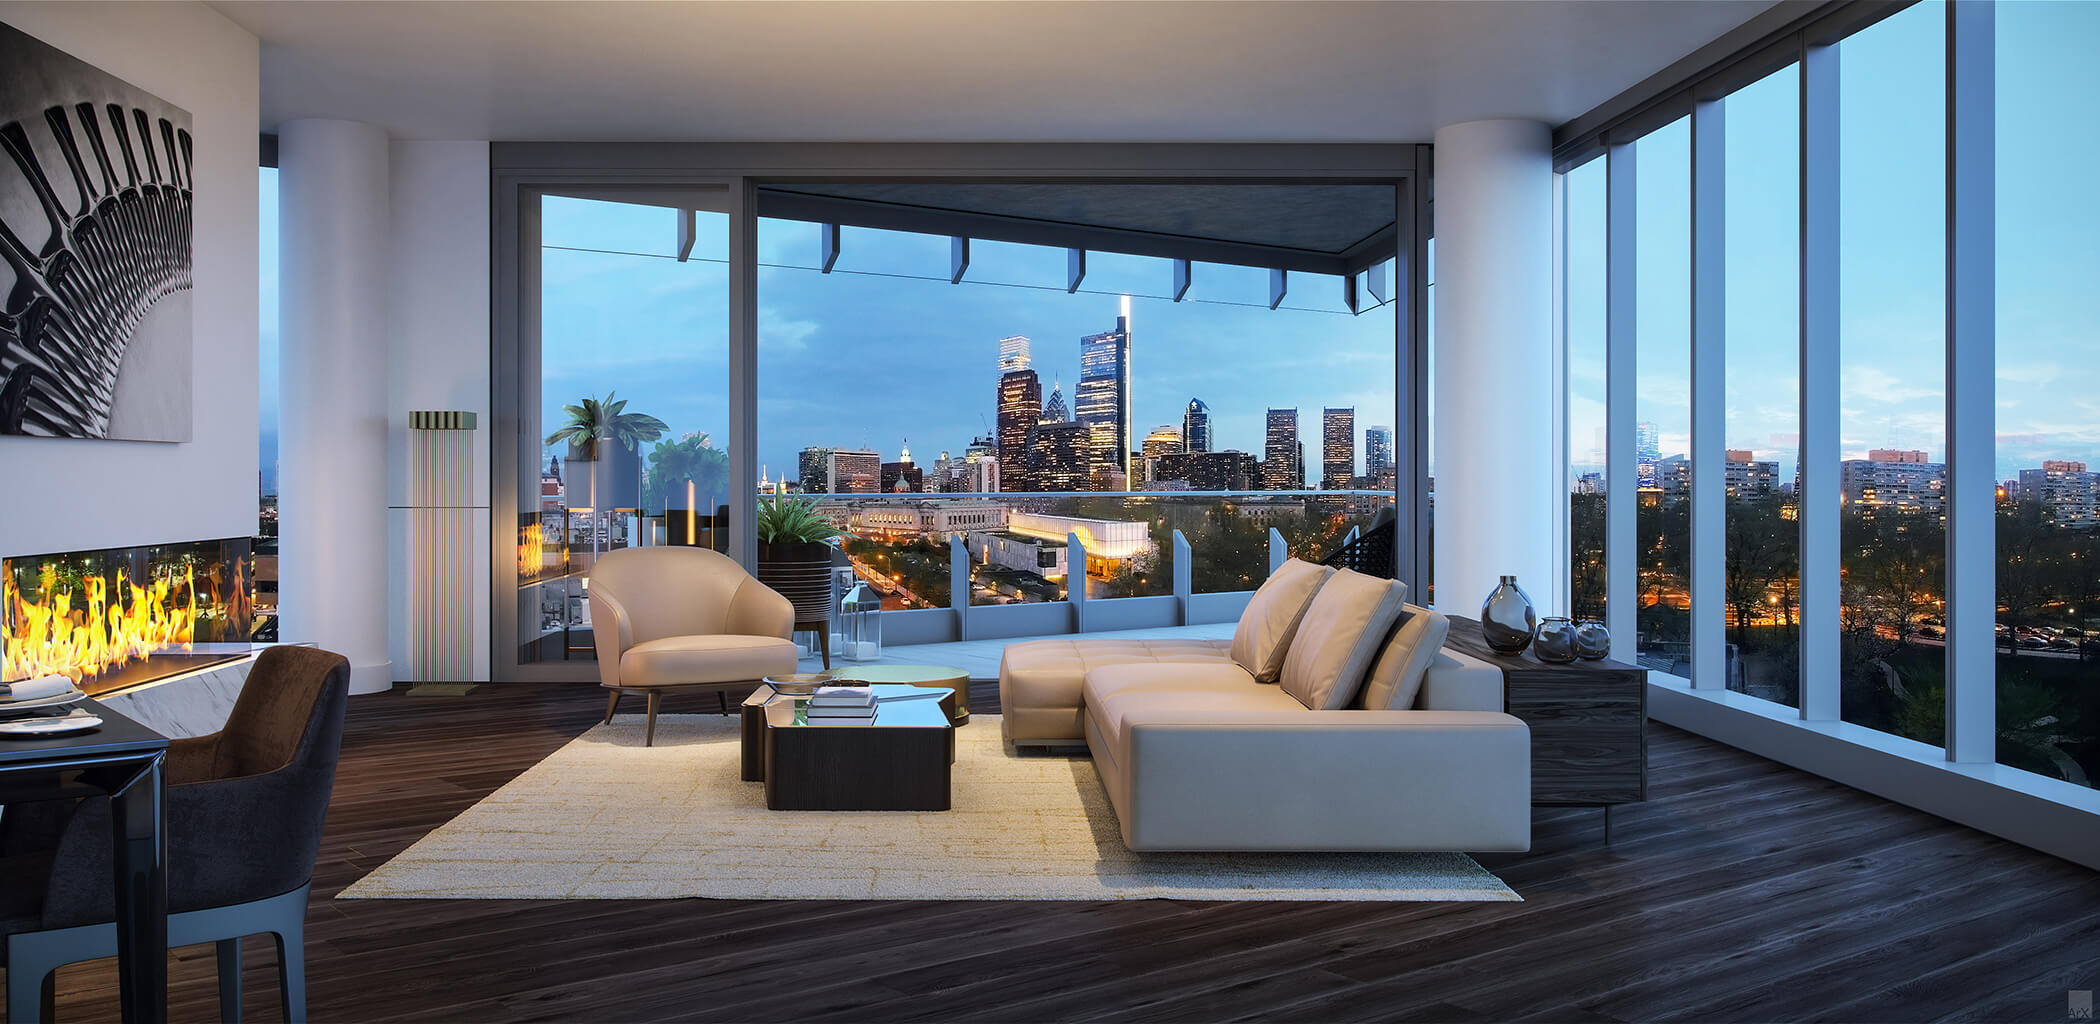 breathtaking view of city skyline from living room of luxury condo in Philadelphia